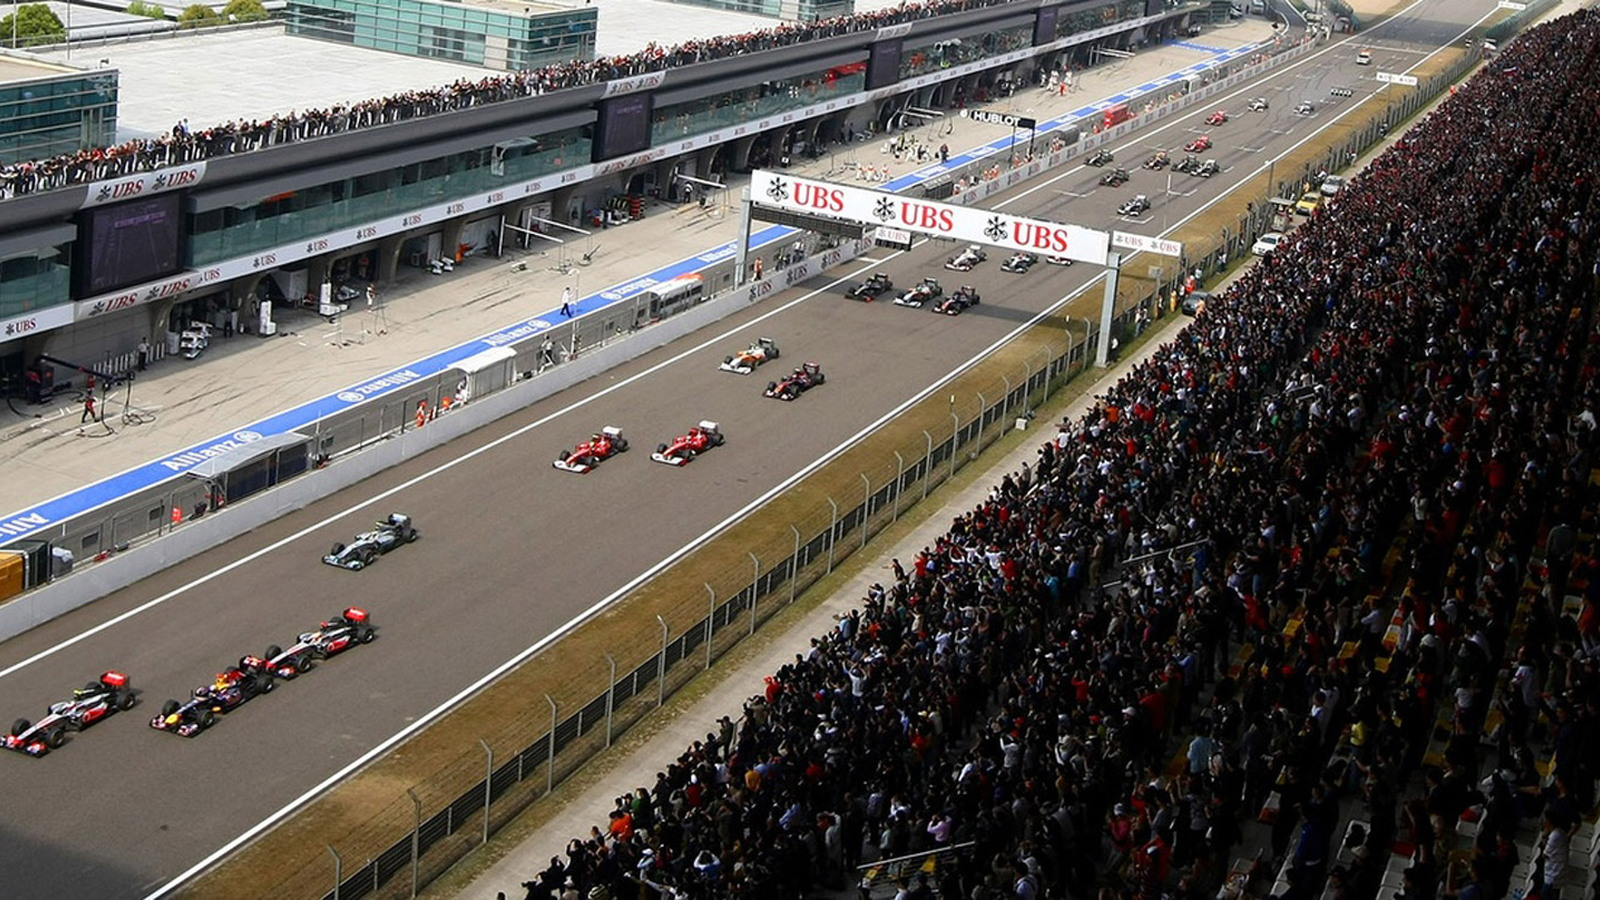 Shanghai International Circuit, home of the Formula 1 Chinese Grand Prix